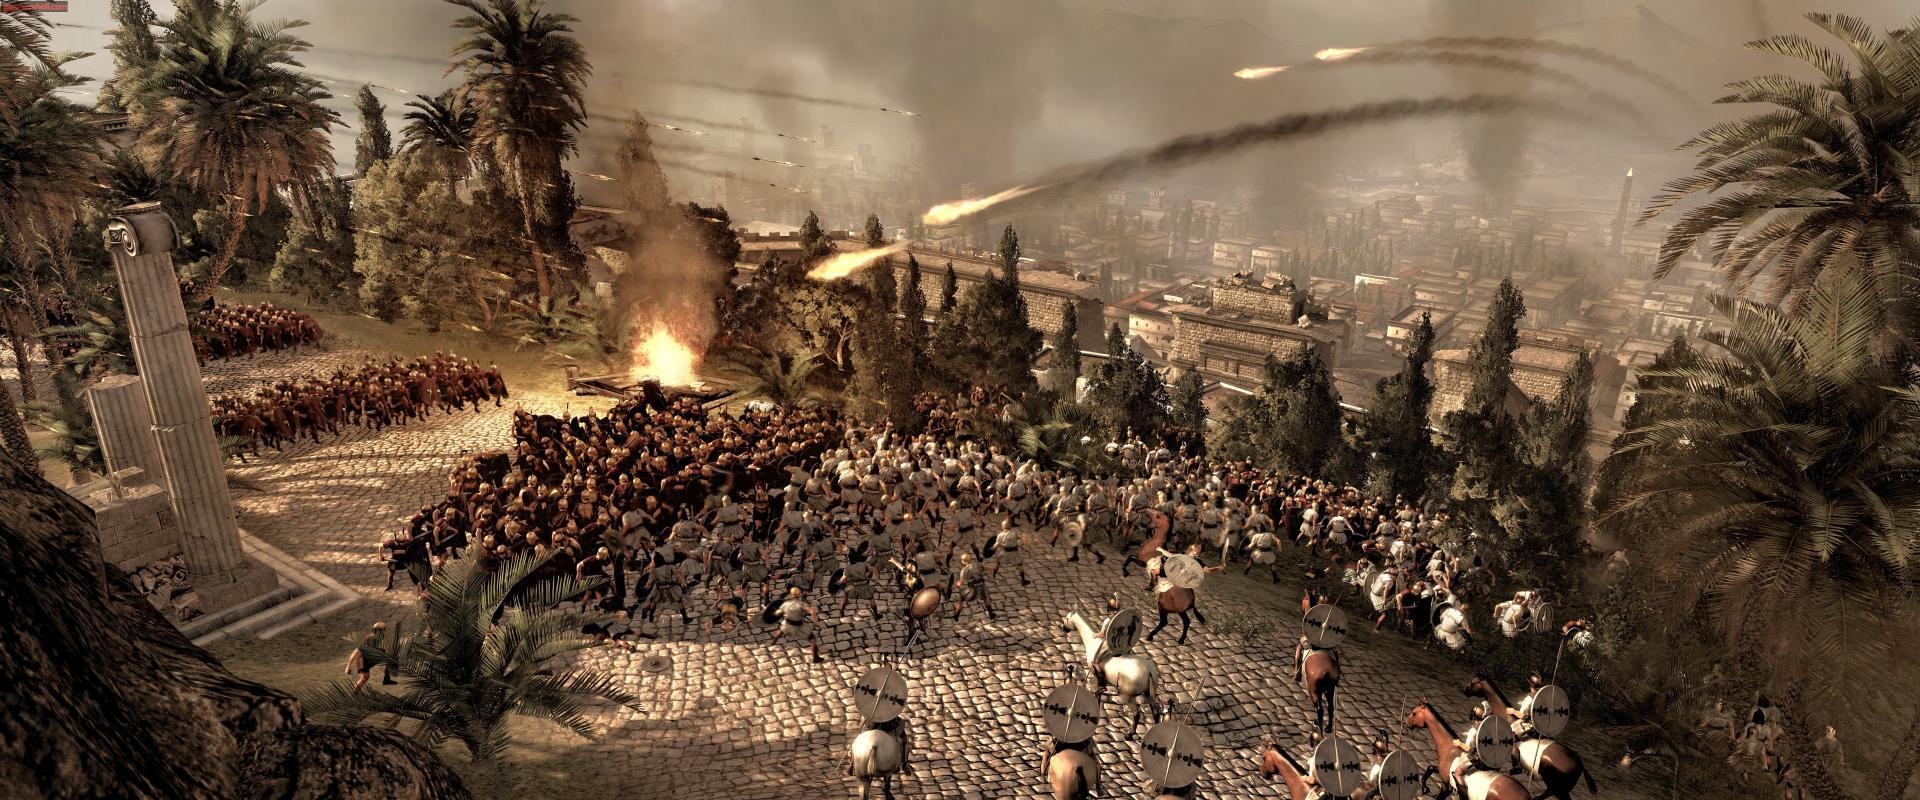 Rome Total War Wallpaper: Total War Rome II Wallpaper HD Download